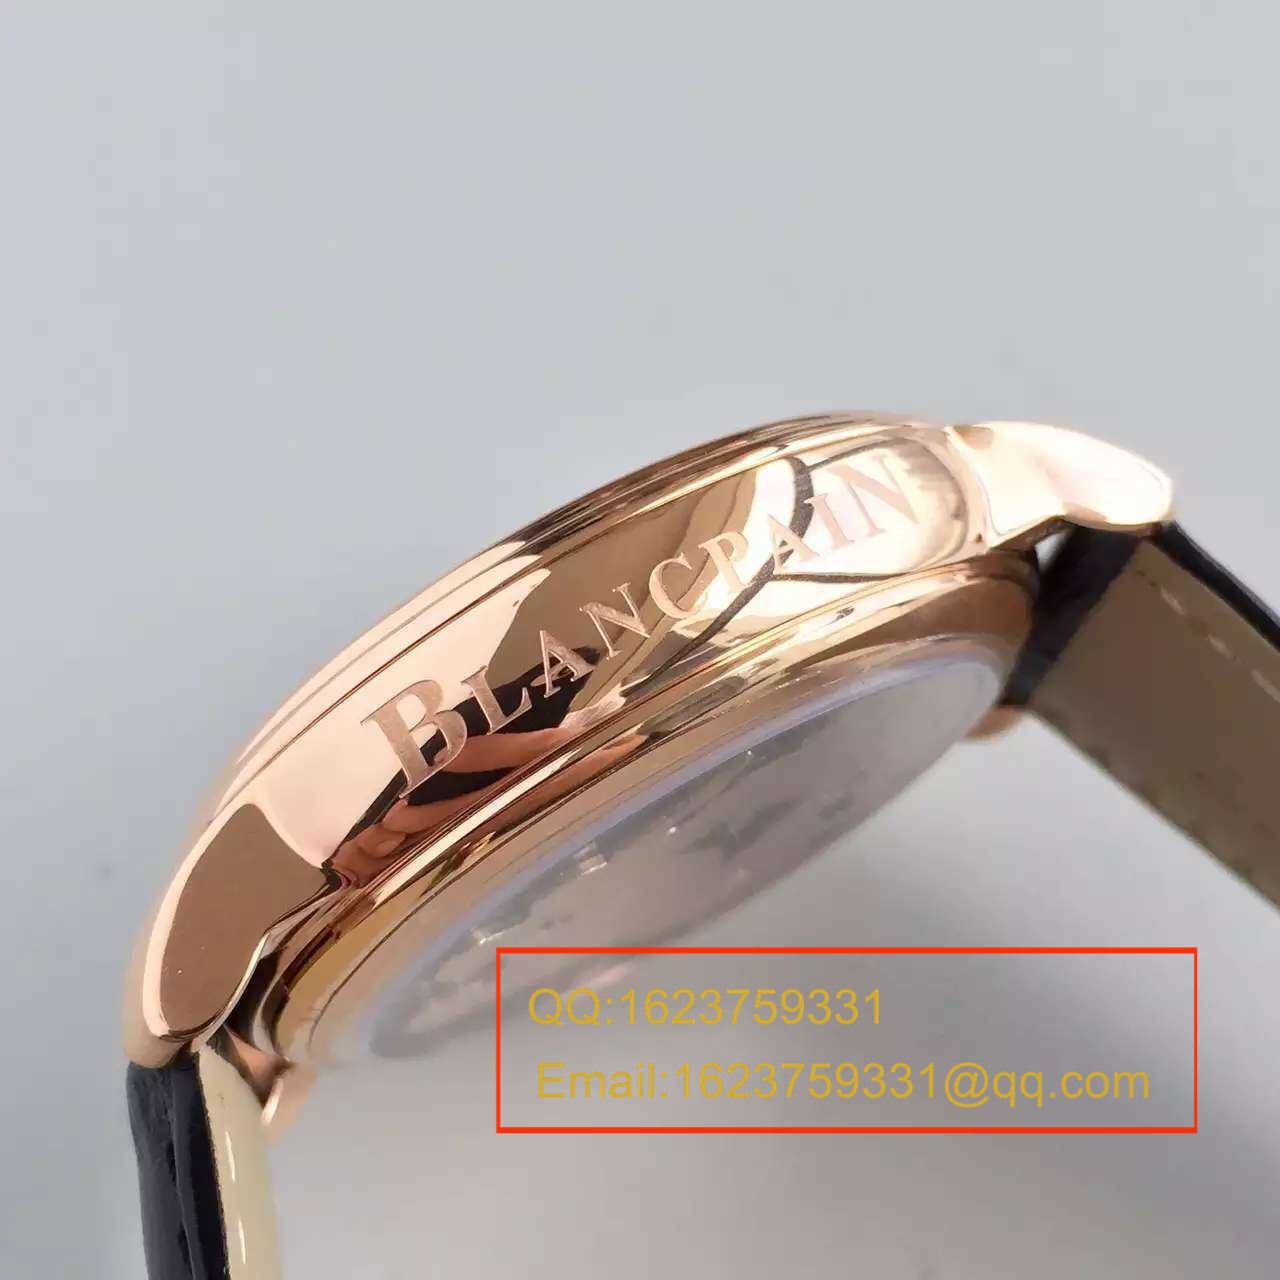 【LH厂超A1:1精仿手表】宝珀巨匠系列布拉苏斯系列 春宫陀飞轮00232-3631-55B腕表